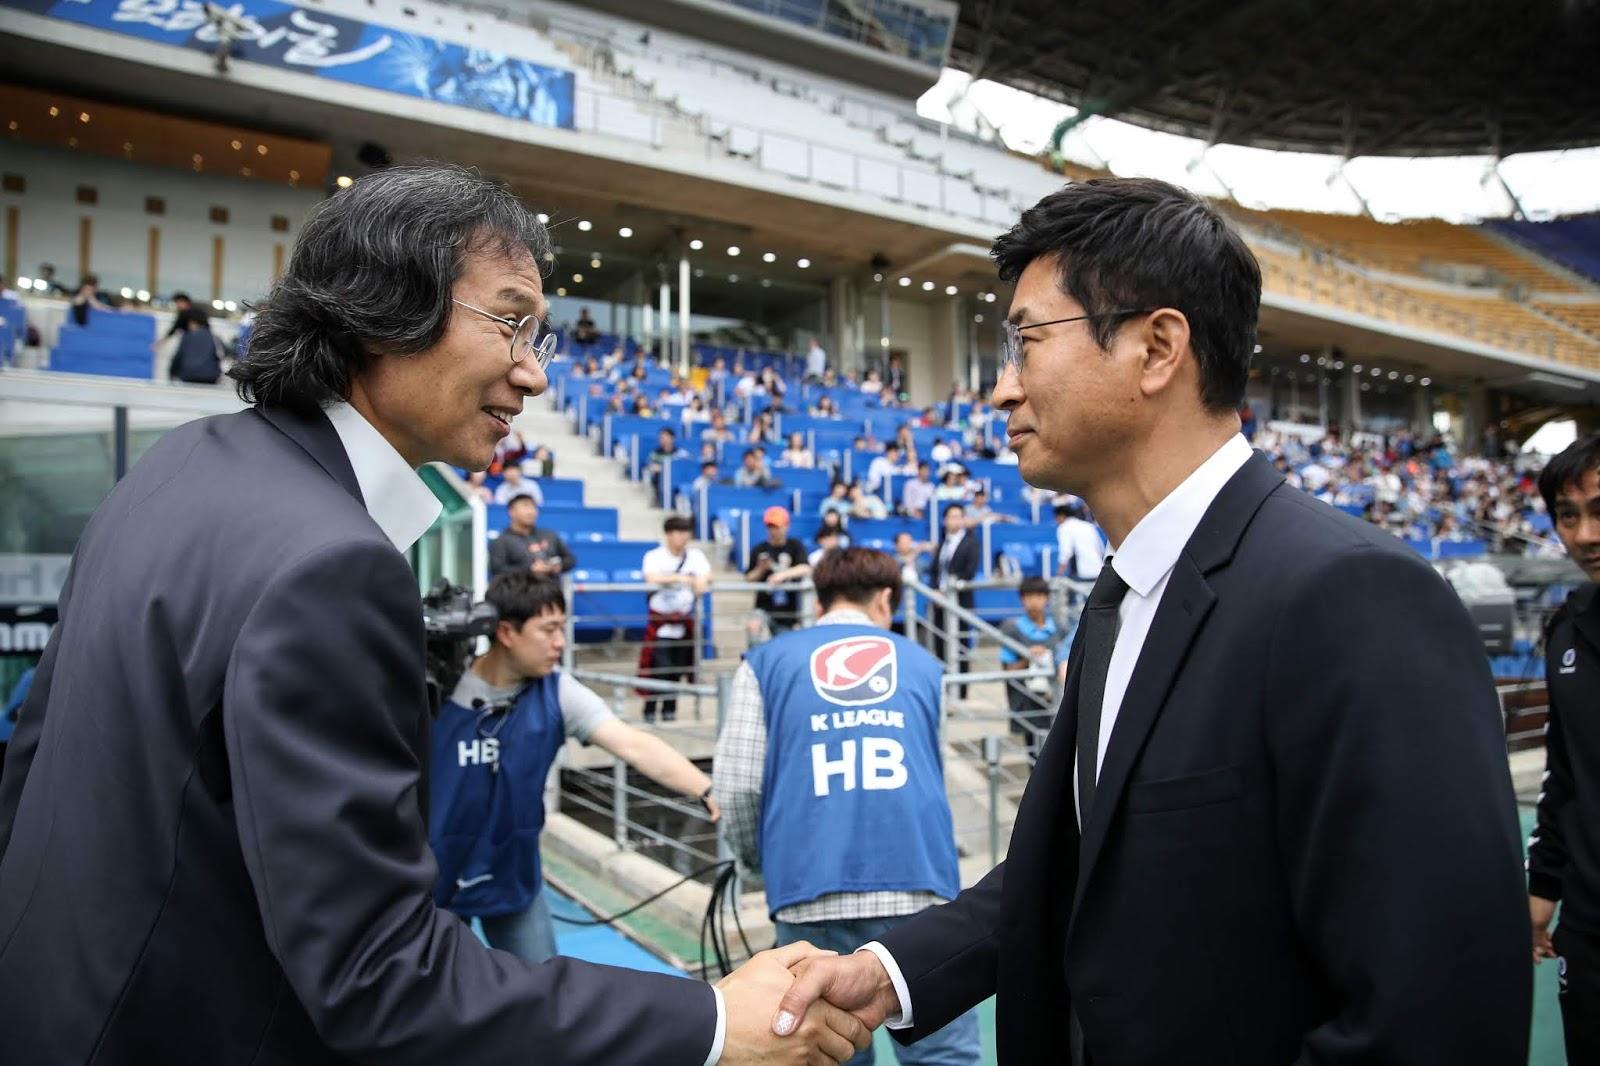 K League 1 East Coast Derby Preview: Ulsan Hyundai vs Pohang Steelers